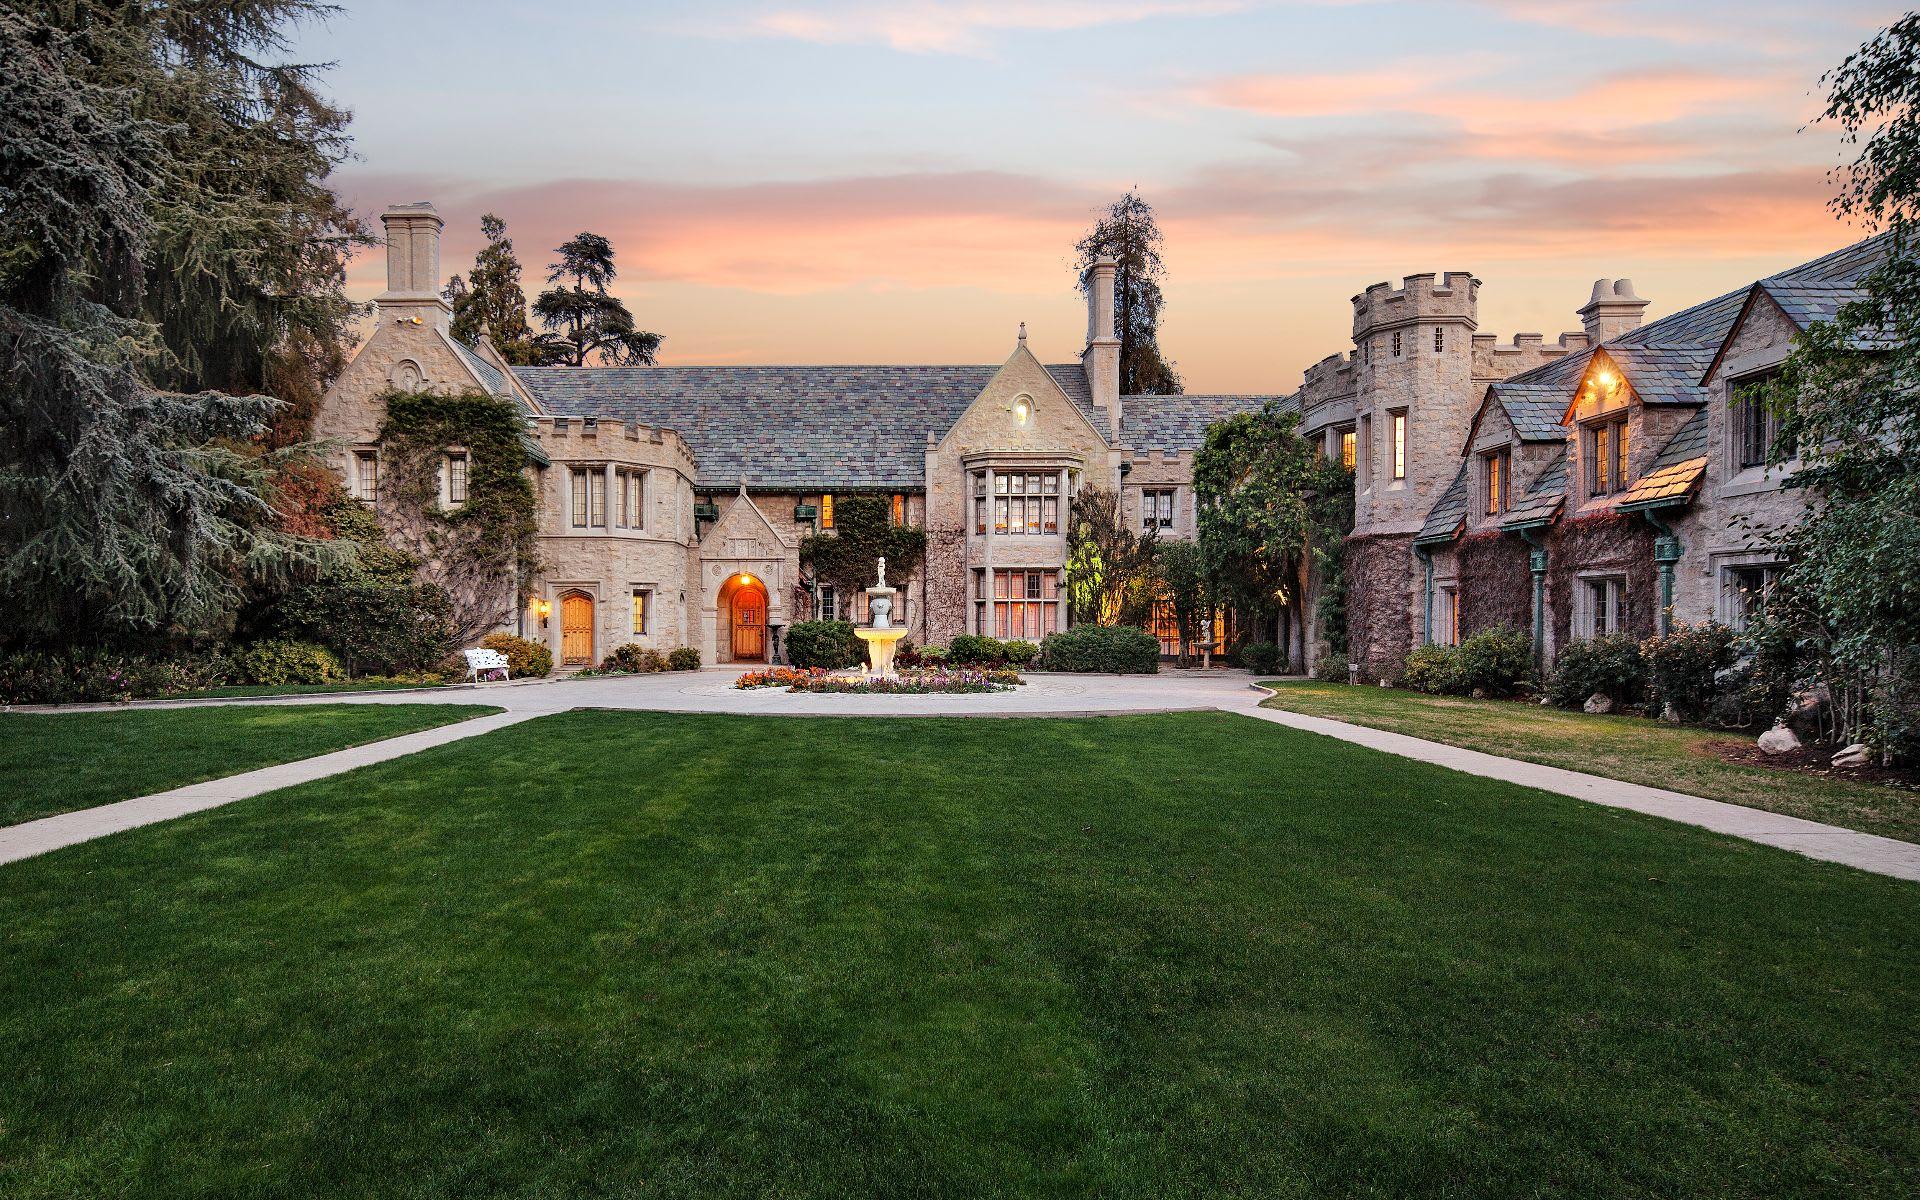 Strange Hilton Hyland Beverly Hills Real Estate Agents Download Free Architecture Designs Sospemadebymaigaardcom